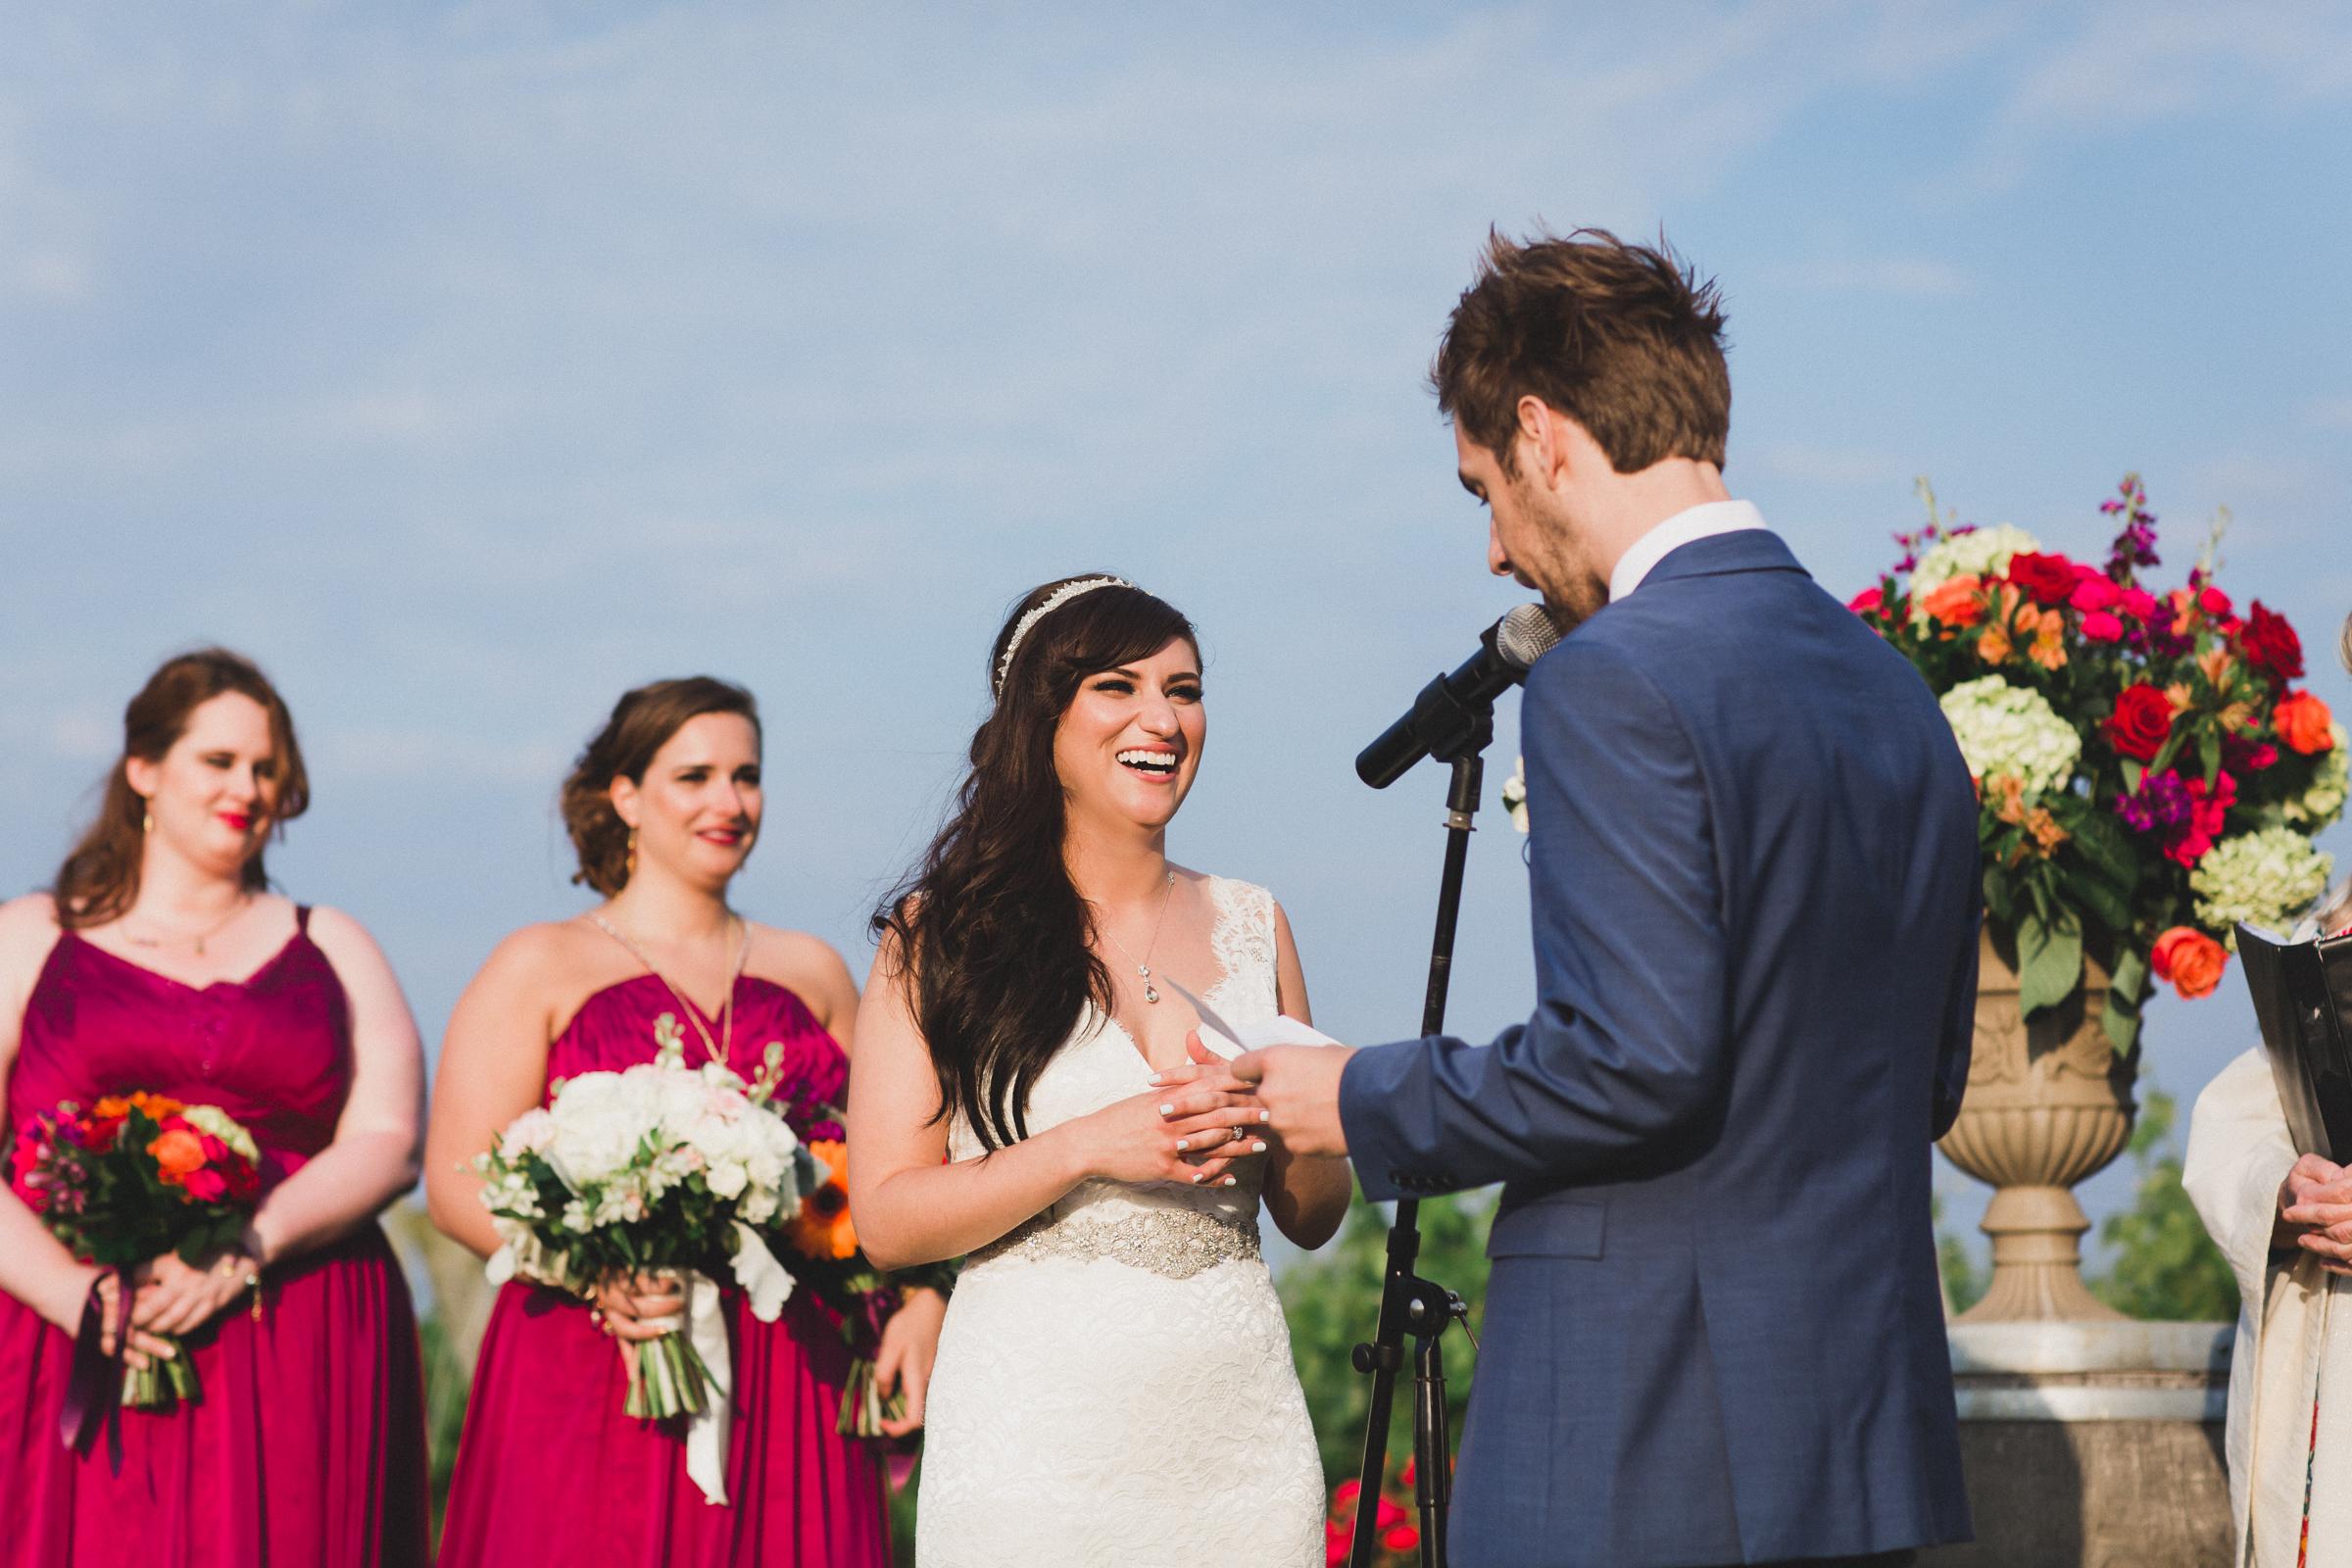 Martha-Clara-Vineyard-Long-Island-Documentary-Wedding-Photographer-54.jpg